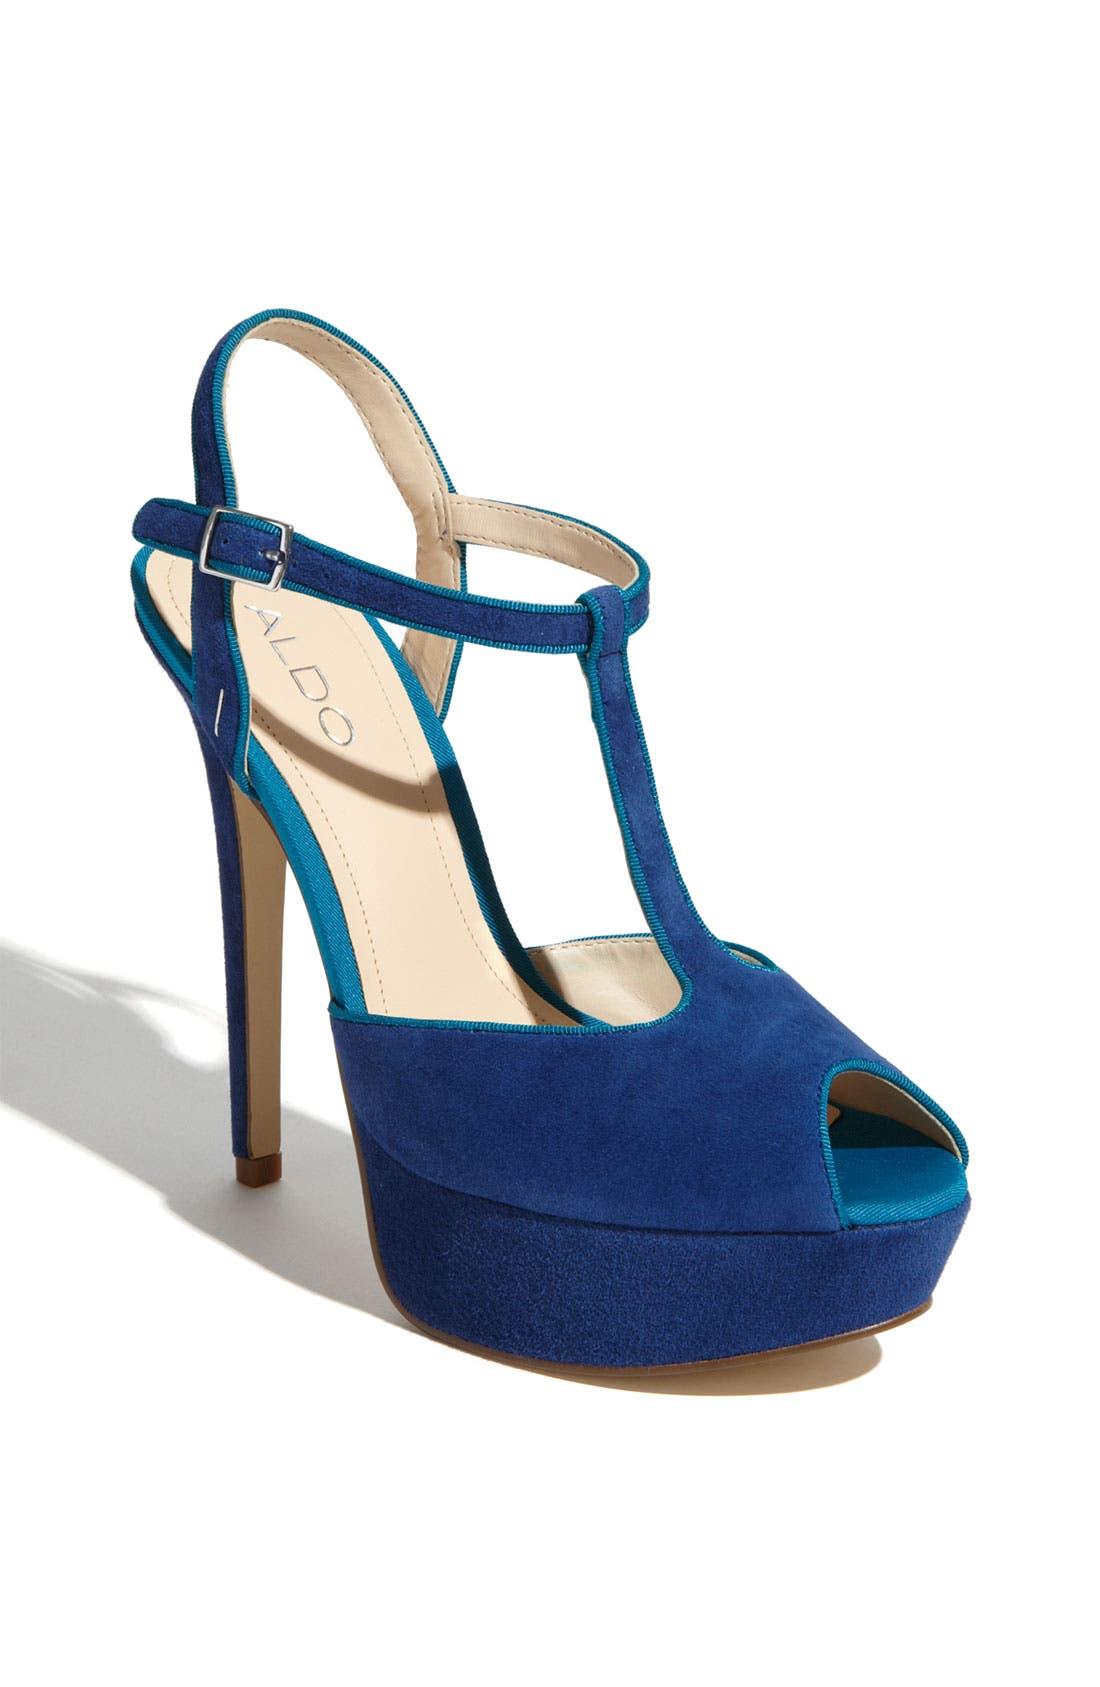 Main Image - ALDO 'Detamble' Sandal